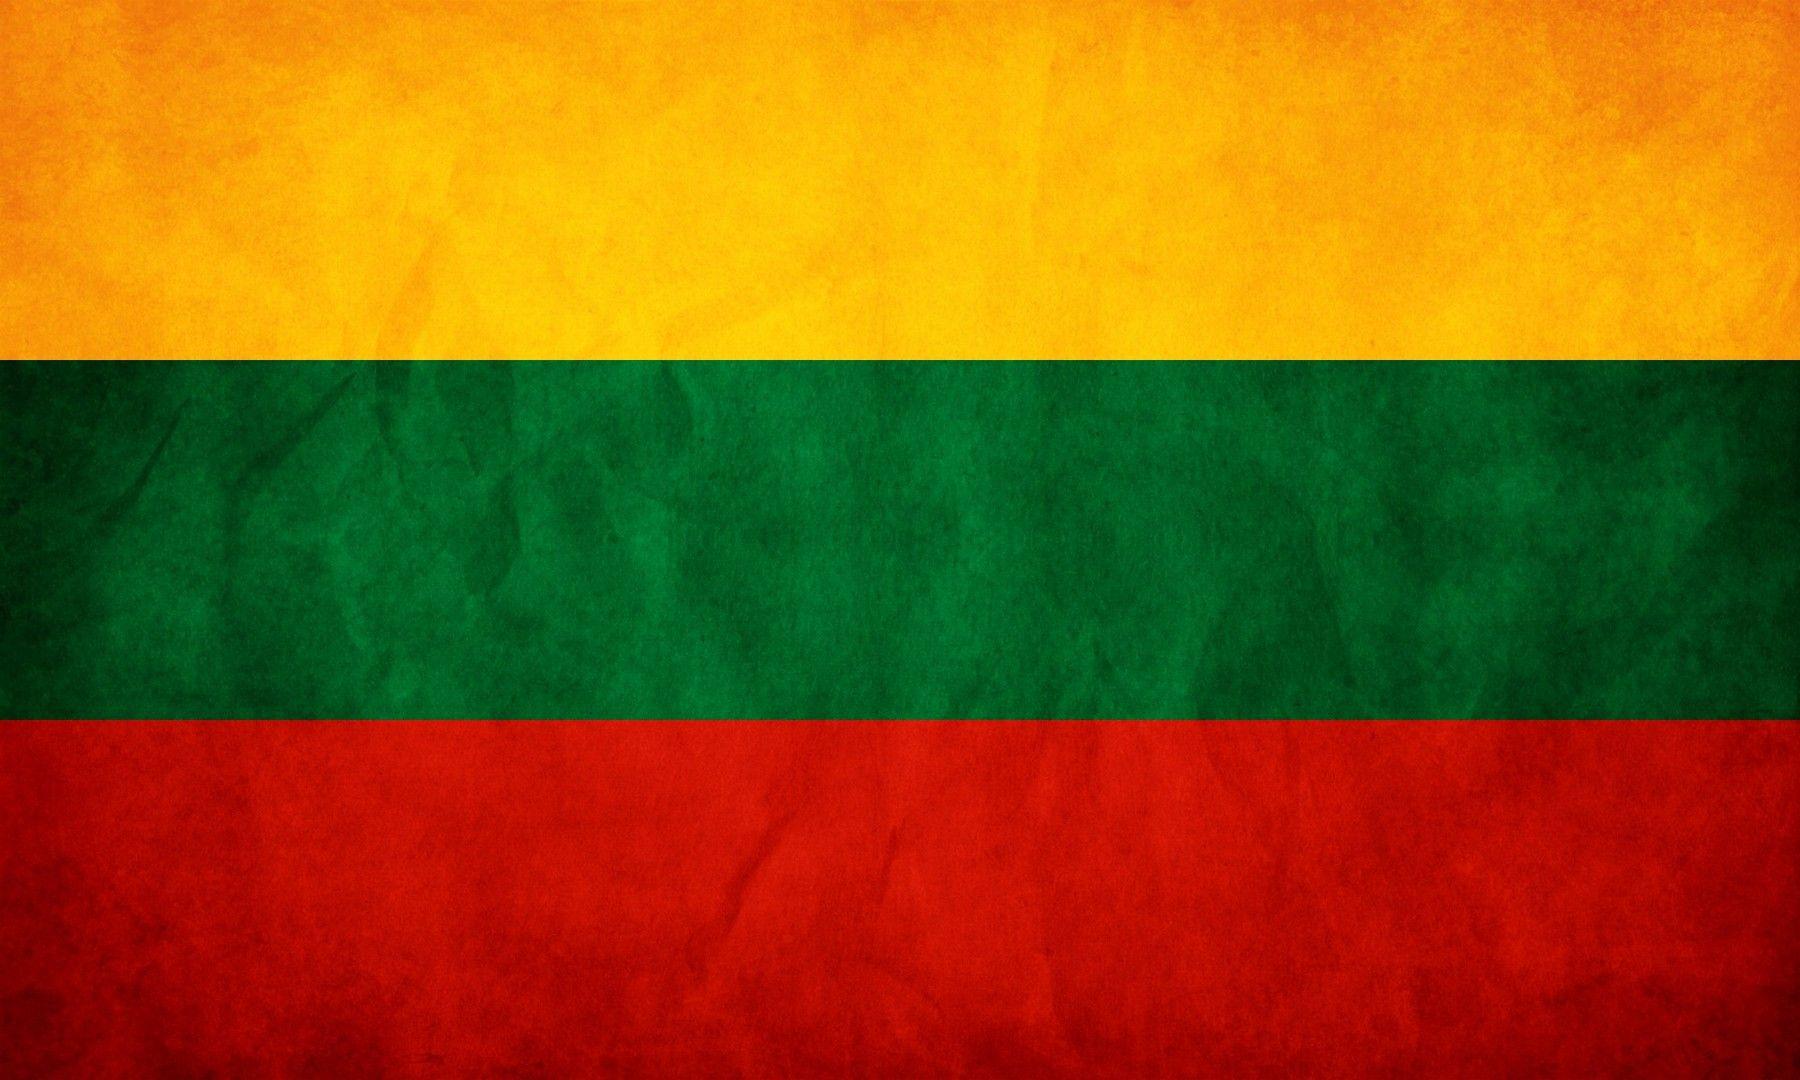 Flag of Lithuania wallpaper Education Lithuania flag 1800x1080